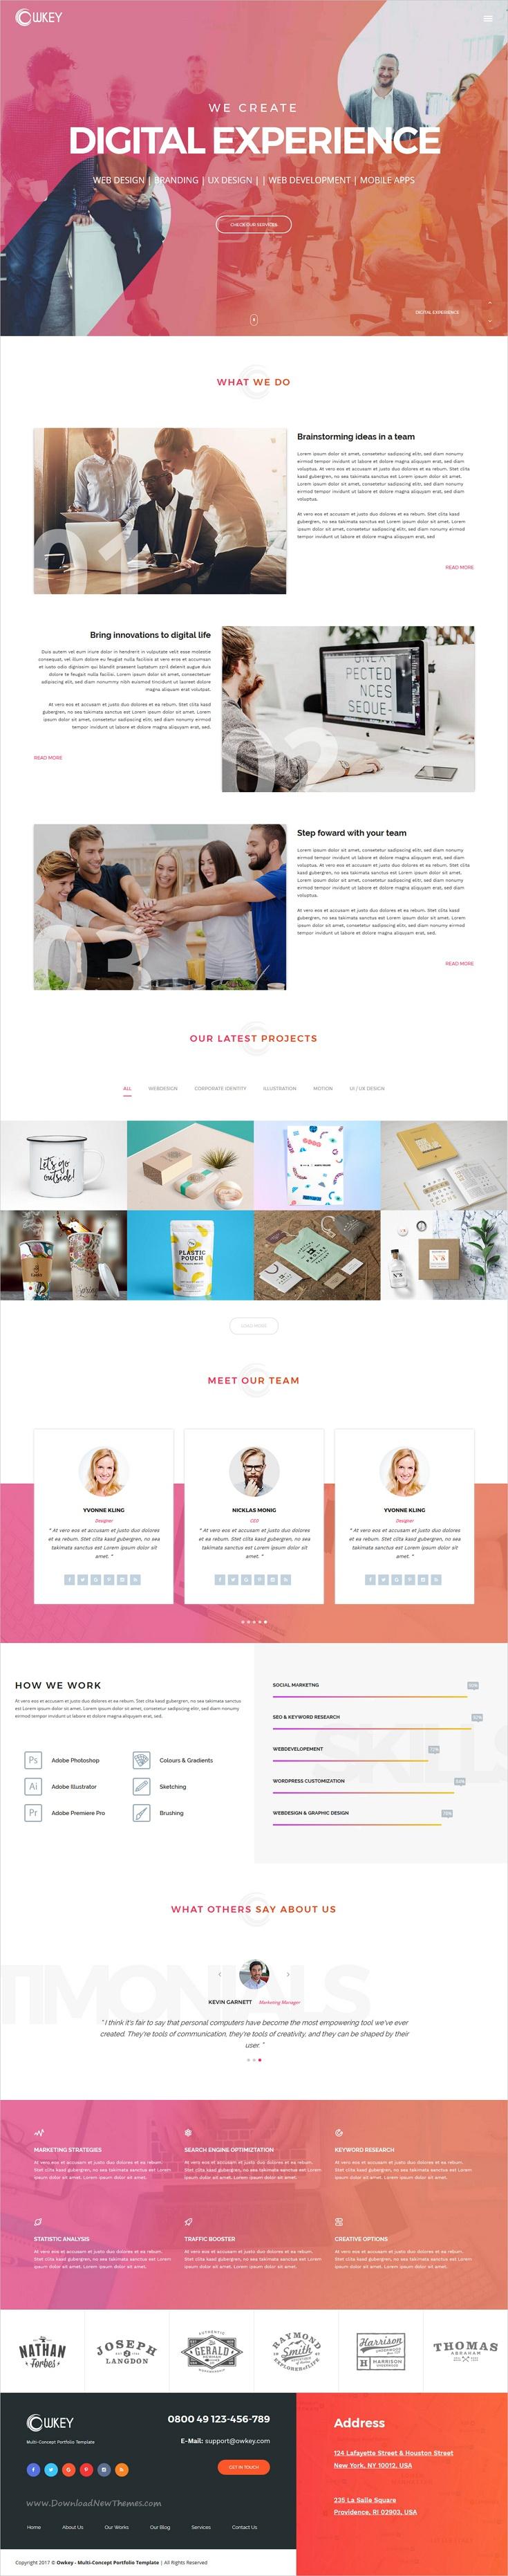 Owkey Is An Elegant And Modern Design 4in1 Responsive Html Bootstrap Template For Corporate Business Website Download Now Https Grafik Design Design Grafik